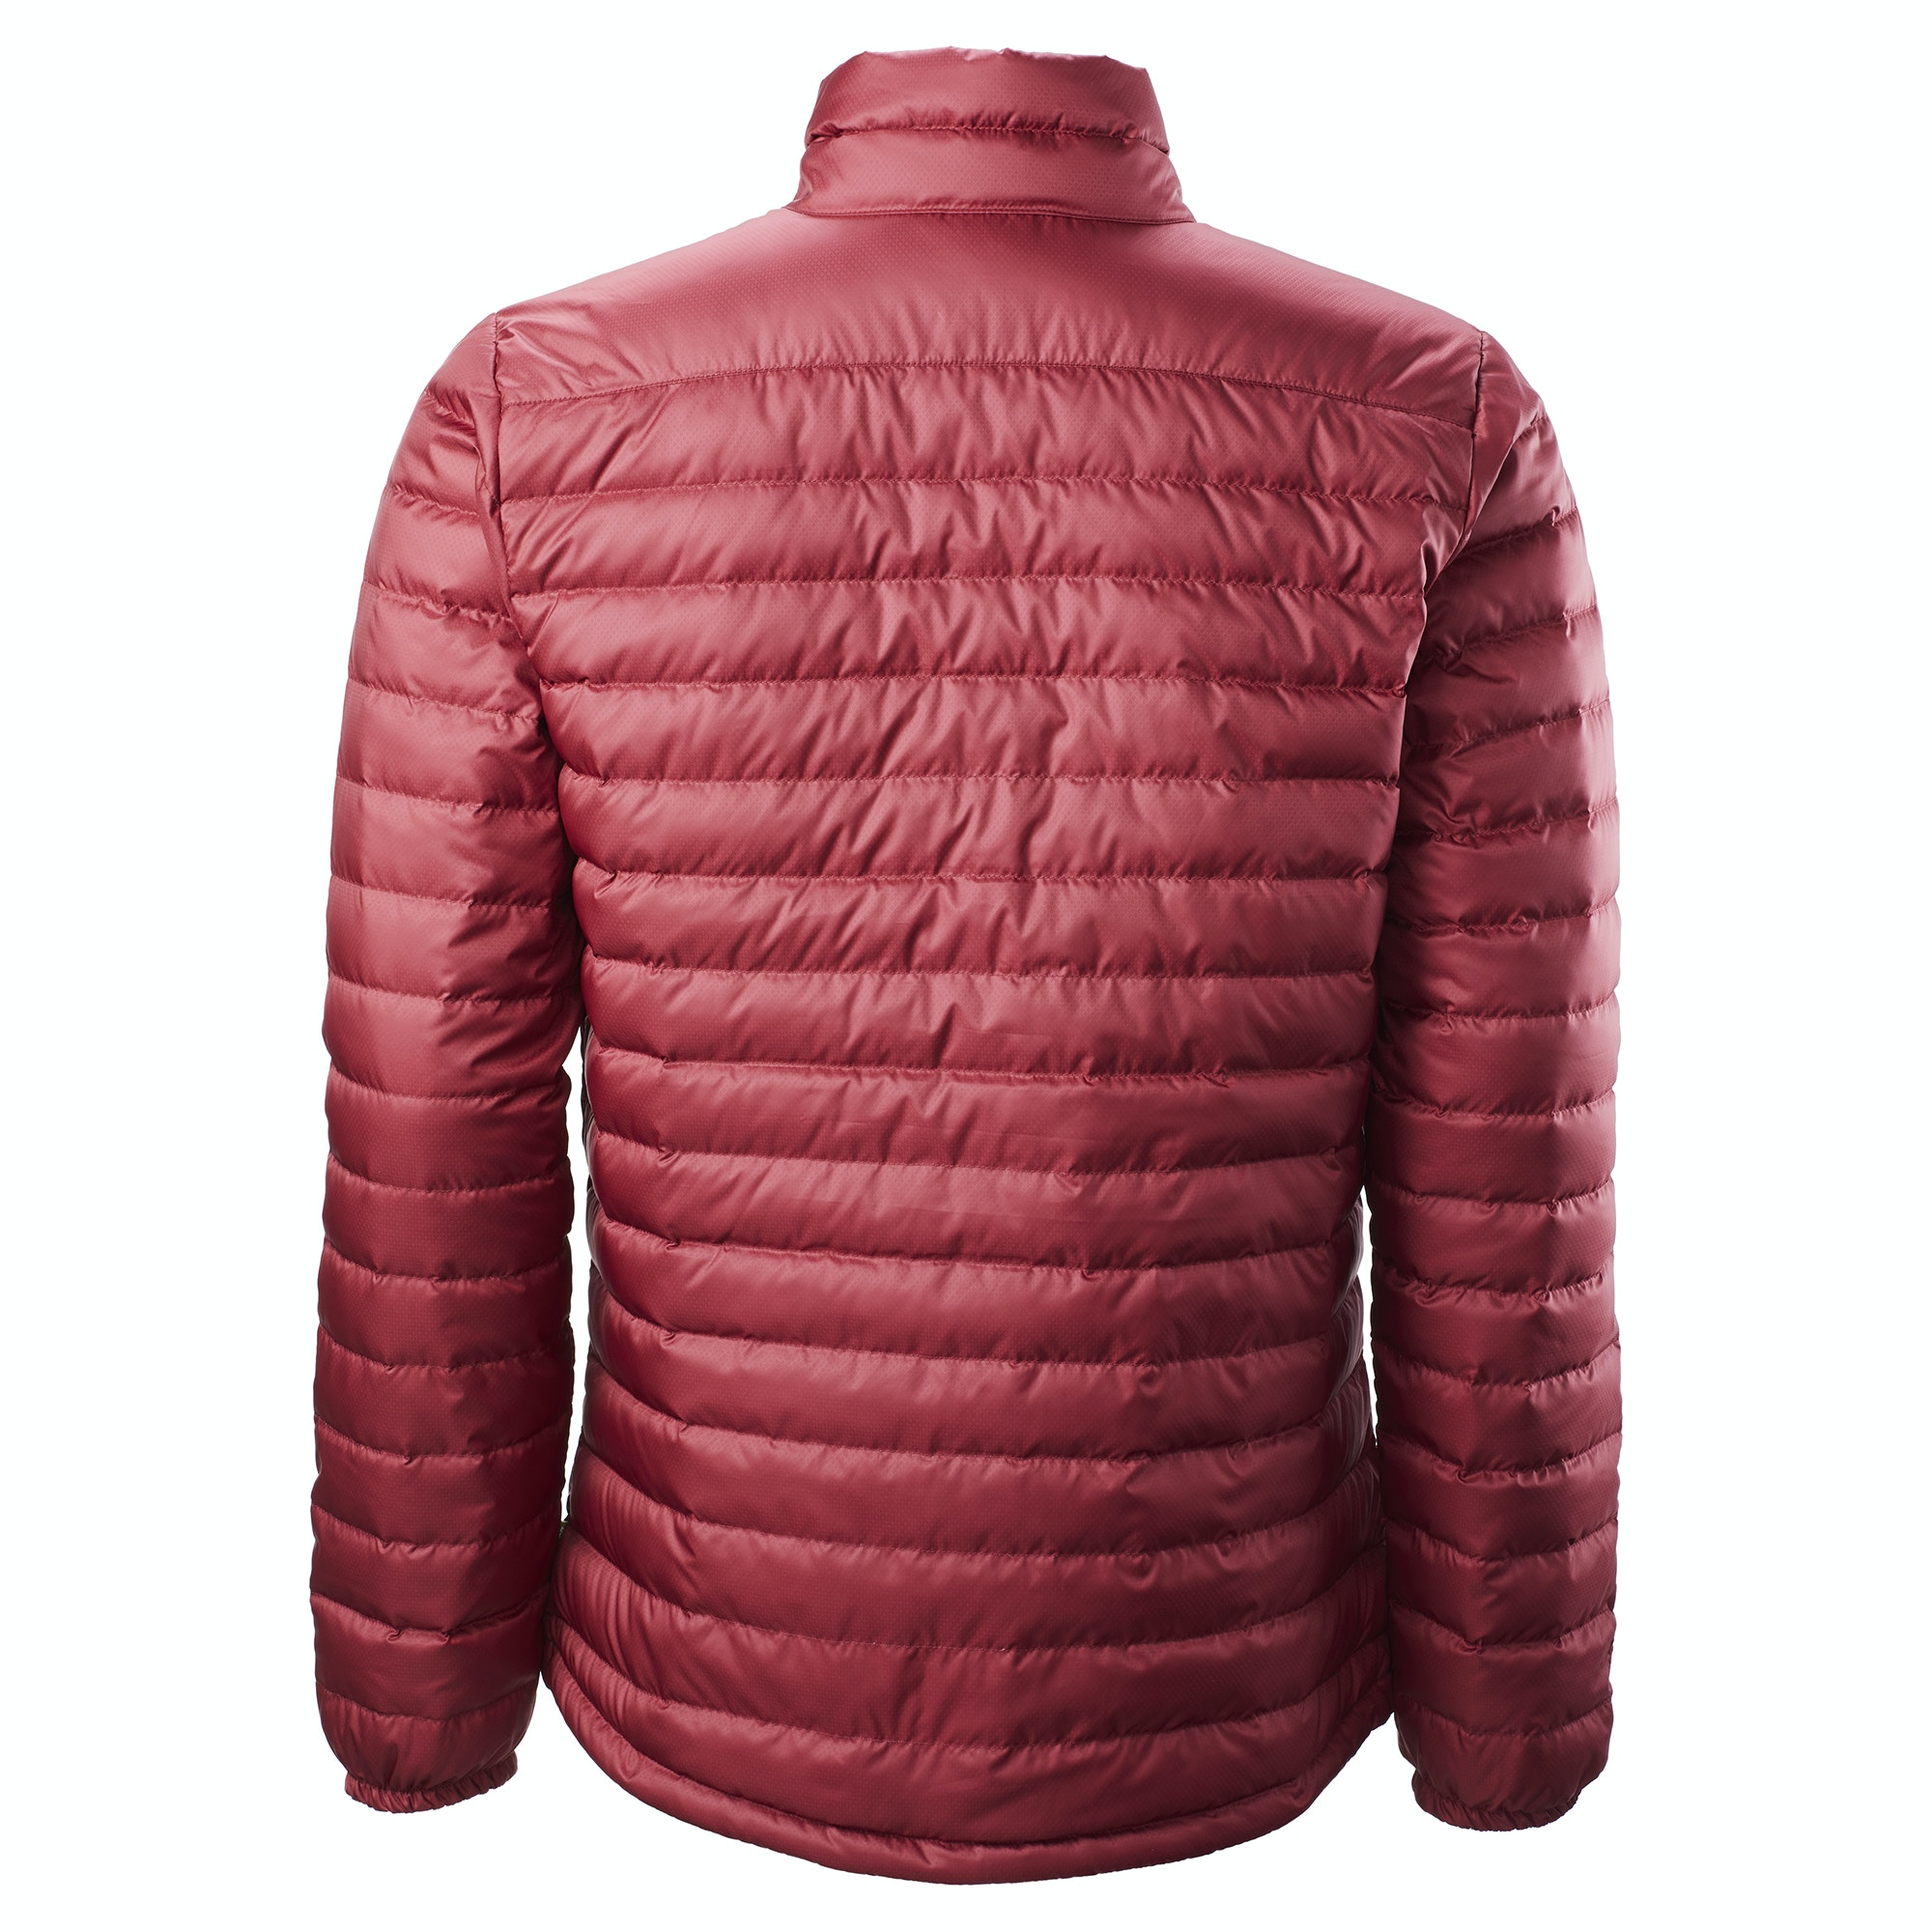 NEW-Kathmandu-Heli-Men-039-s-Lightweight-Duck-Down-Coat-Warm-Puffer-Jacket-v2 thumbnail 16